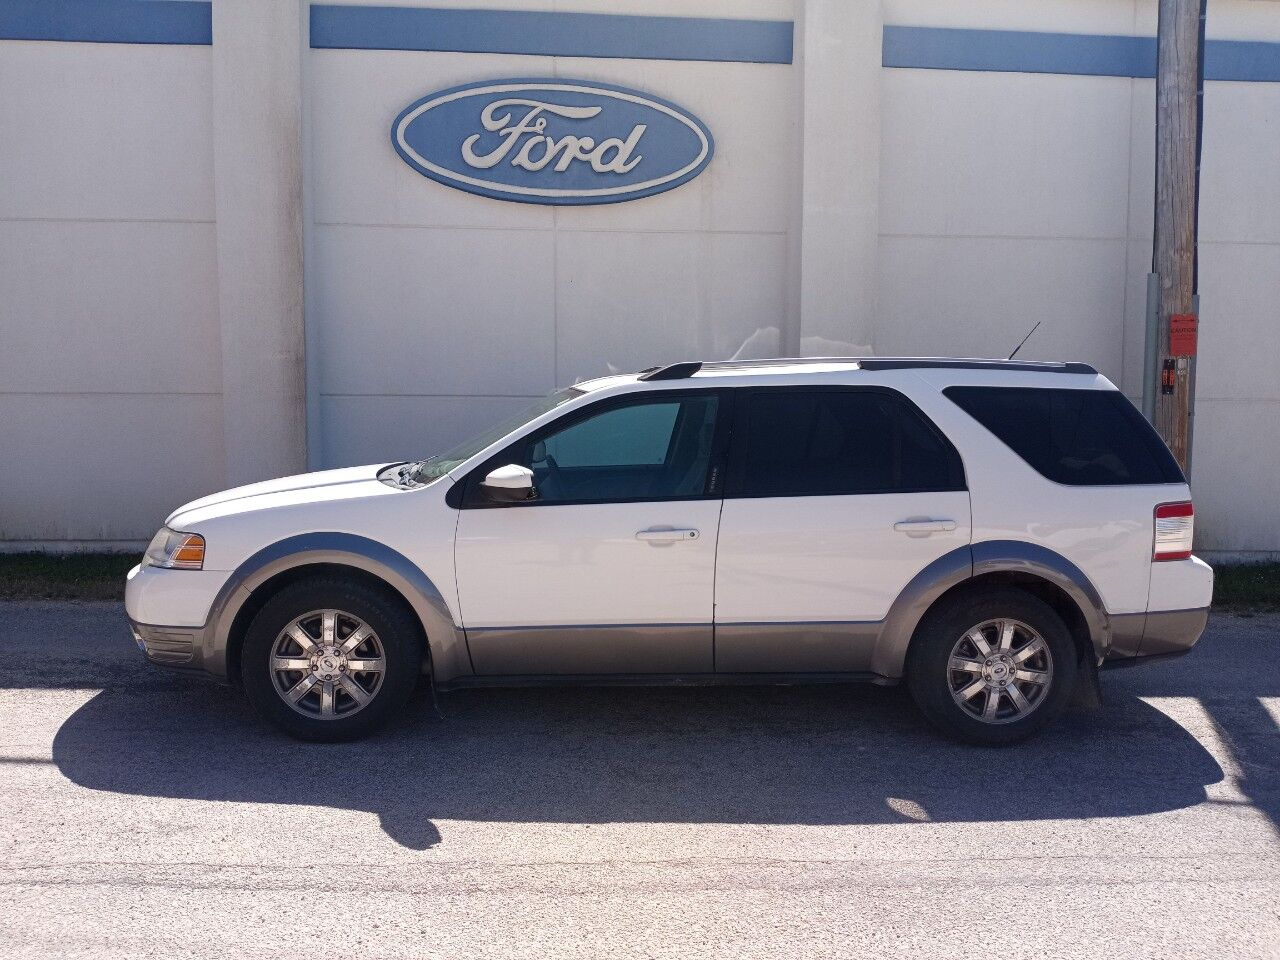 2008 Ford Taurus X Edgewood IA